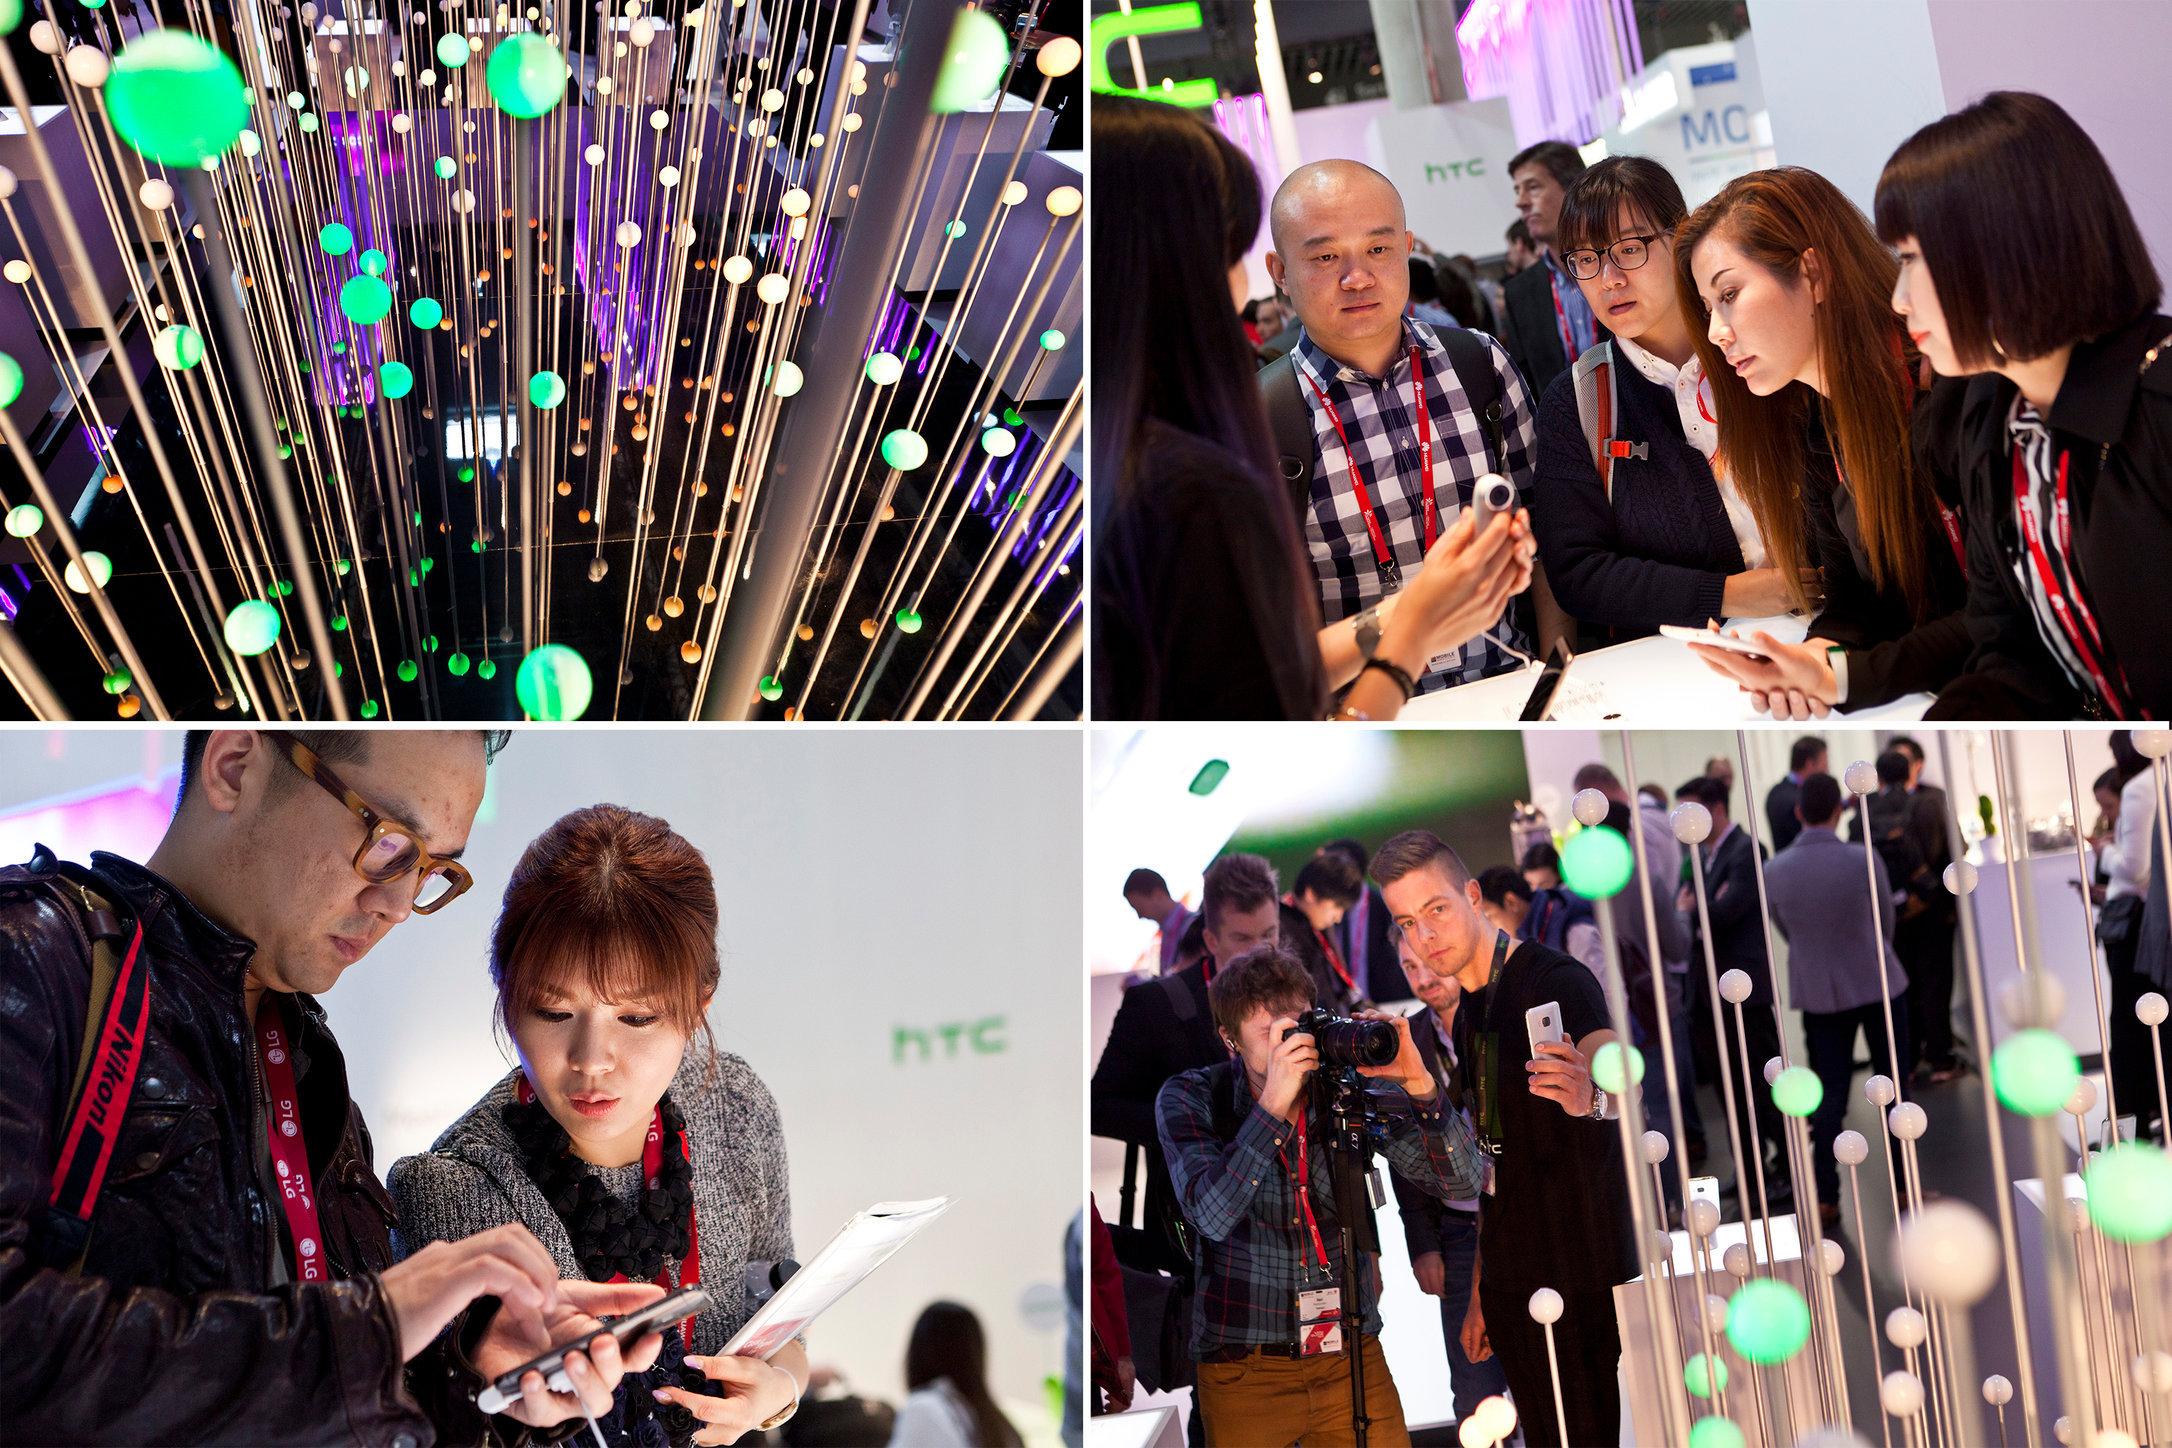 0008_HTC-MWC2015-4510-HighRes.jpg